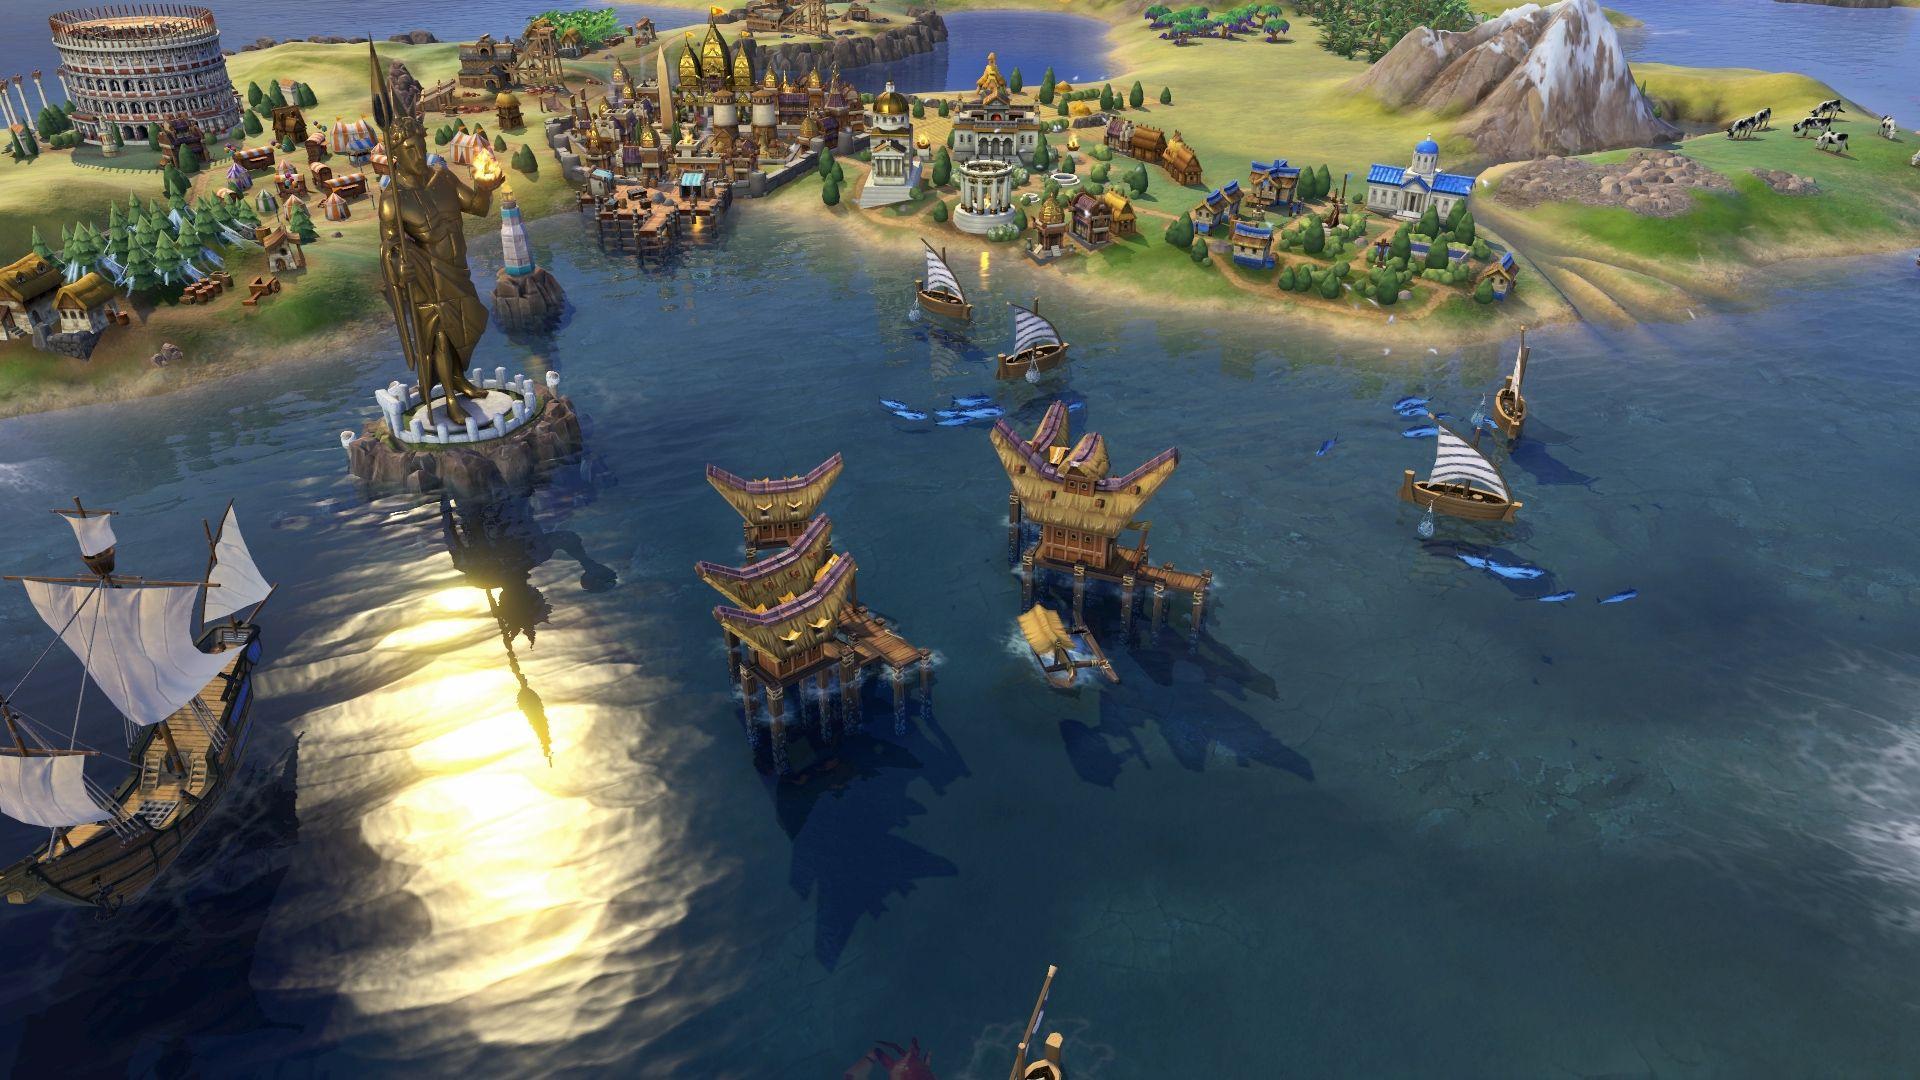 2KGMKT_CivilizationVI_Game-Image_DLC6_Kampung_1_5.jpg